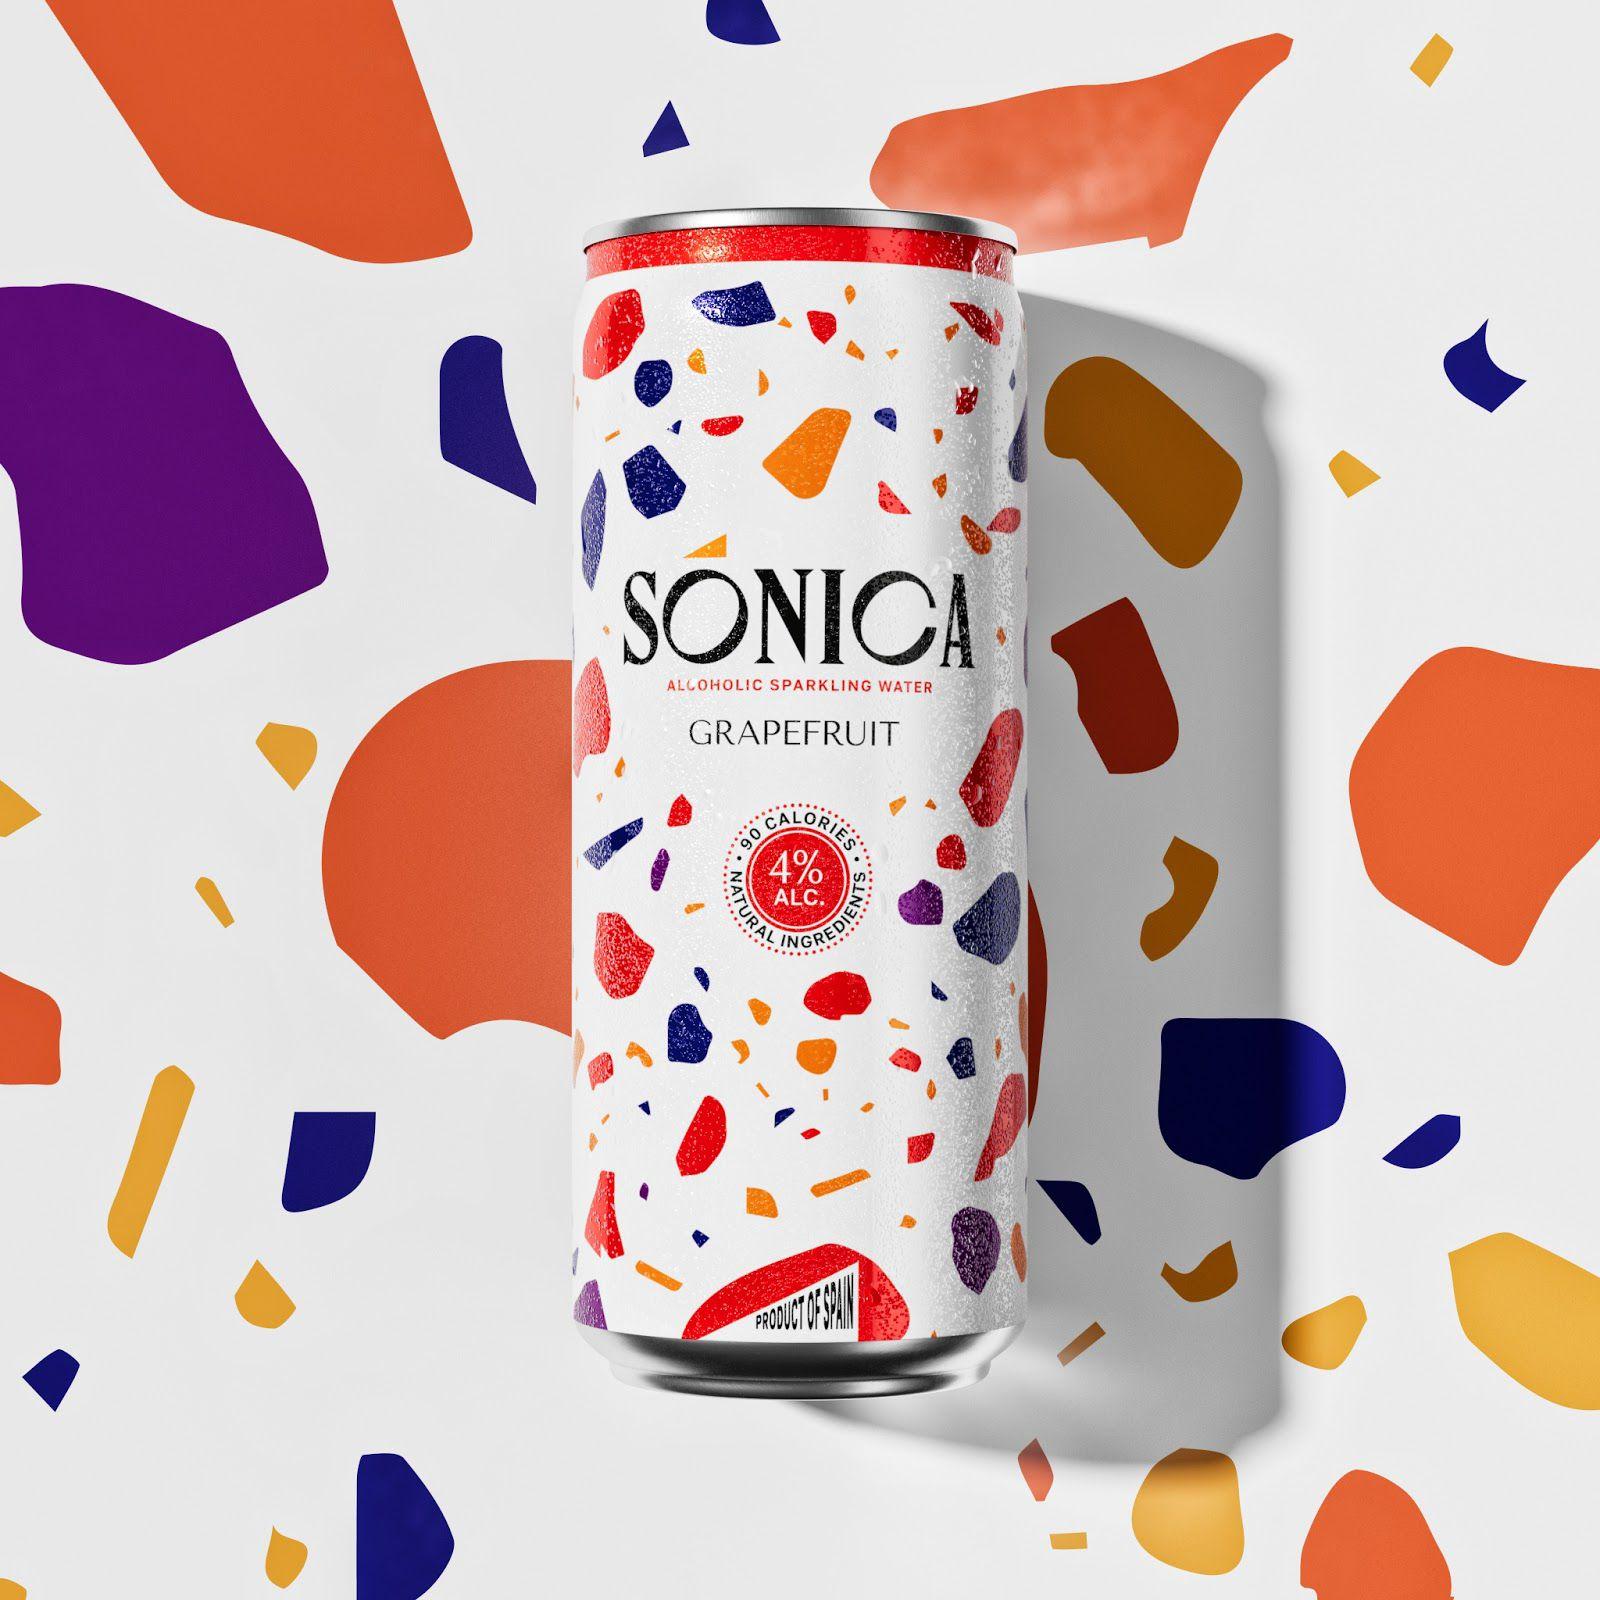 Sonica drinks (eau pétillante légèrement alcoolisée) I Design : Igor Borisenko et Pavel Sirota, Russie (août 2020)